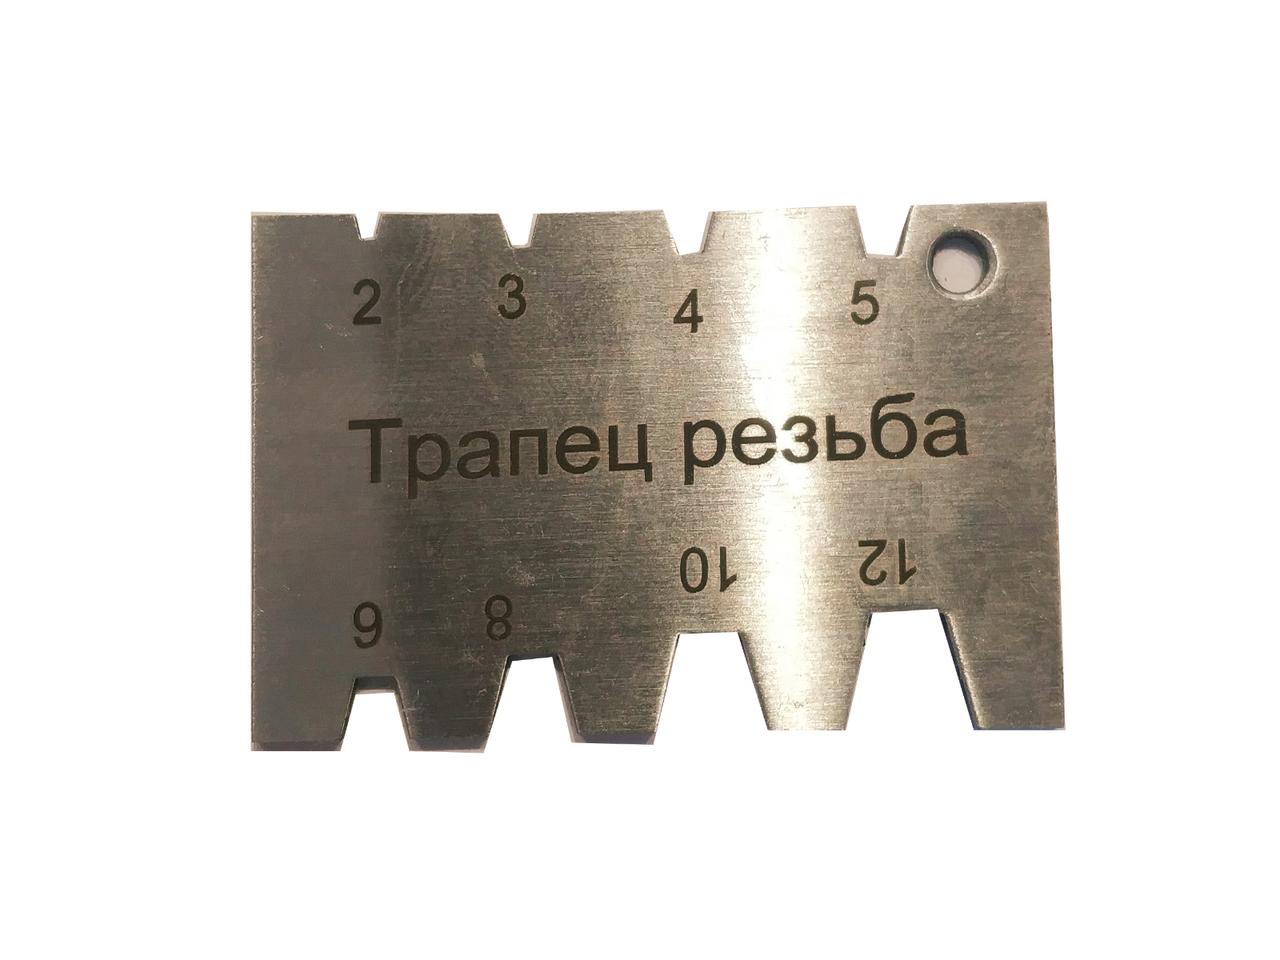 Шаблон для заточки трапецеидальных резцов (2 - 12 мм) №2 (Шаг 2; 3; 4; 5; 6; 8; 10; 12 мм.)